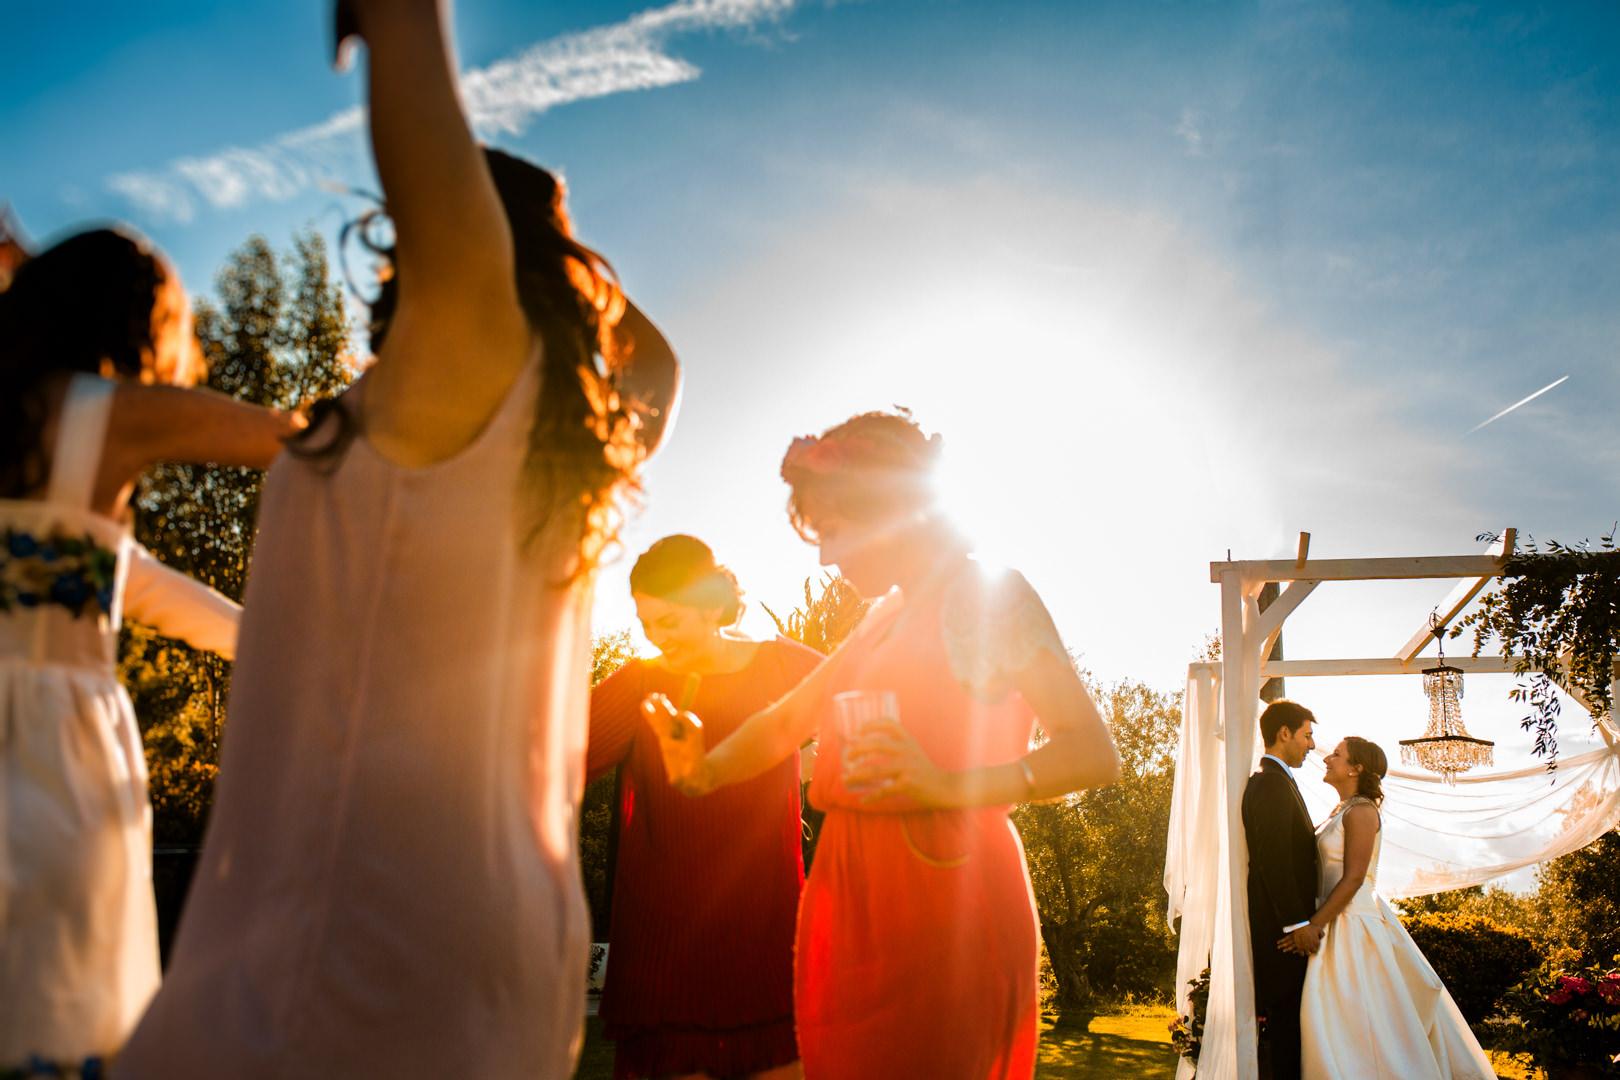 Boda-Catedral-Jaen-Hamburgo-Maria-David-engagement-Rafael-Torres-fotografo-bodas-sevilla-madrid-barcelona-wedding-photographer--48.jpg